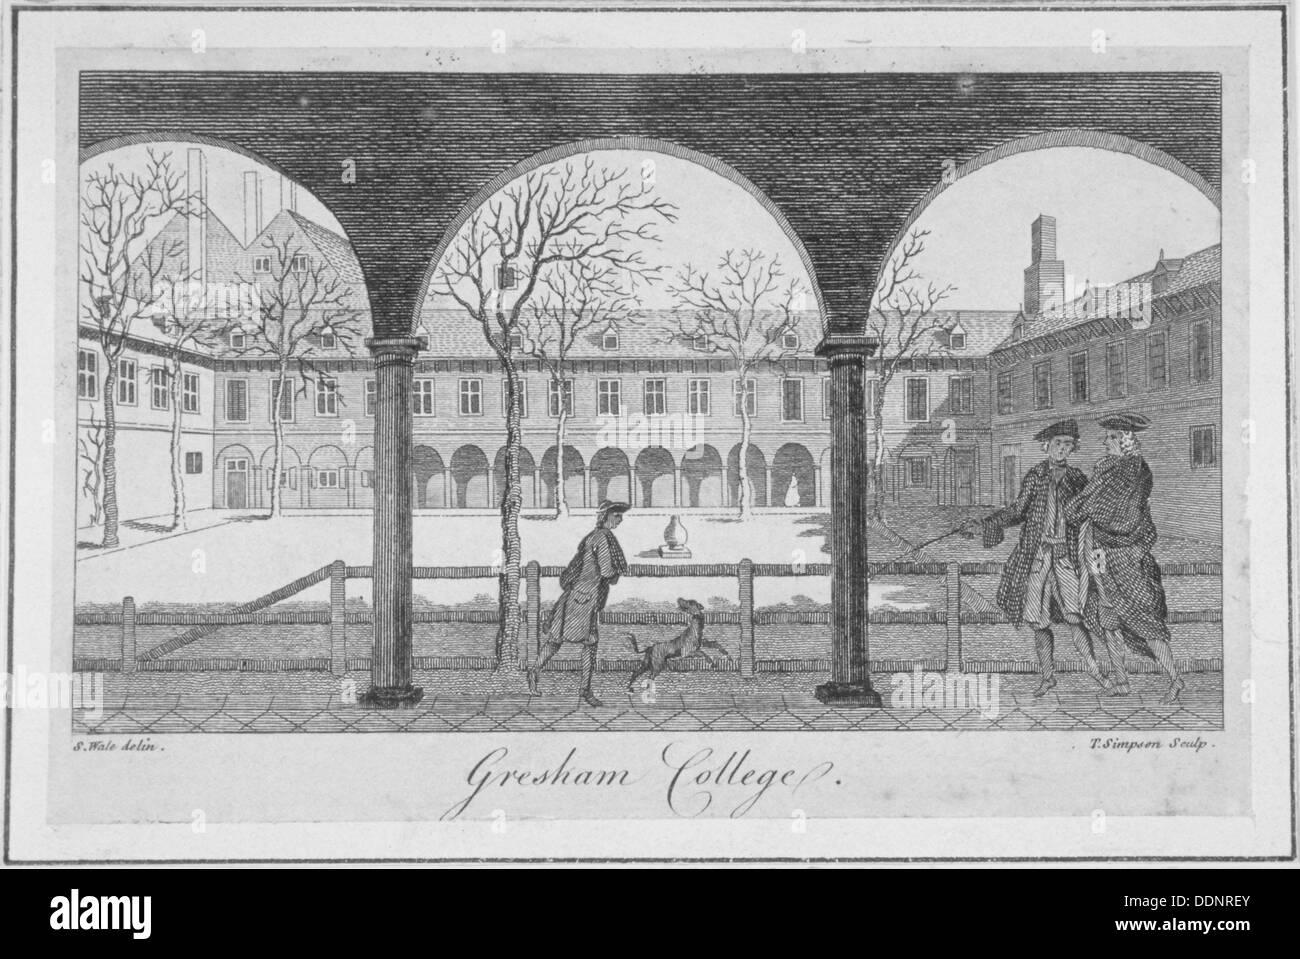 Gresham College, City of London, 1766. Artist: Anon - Stock Image